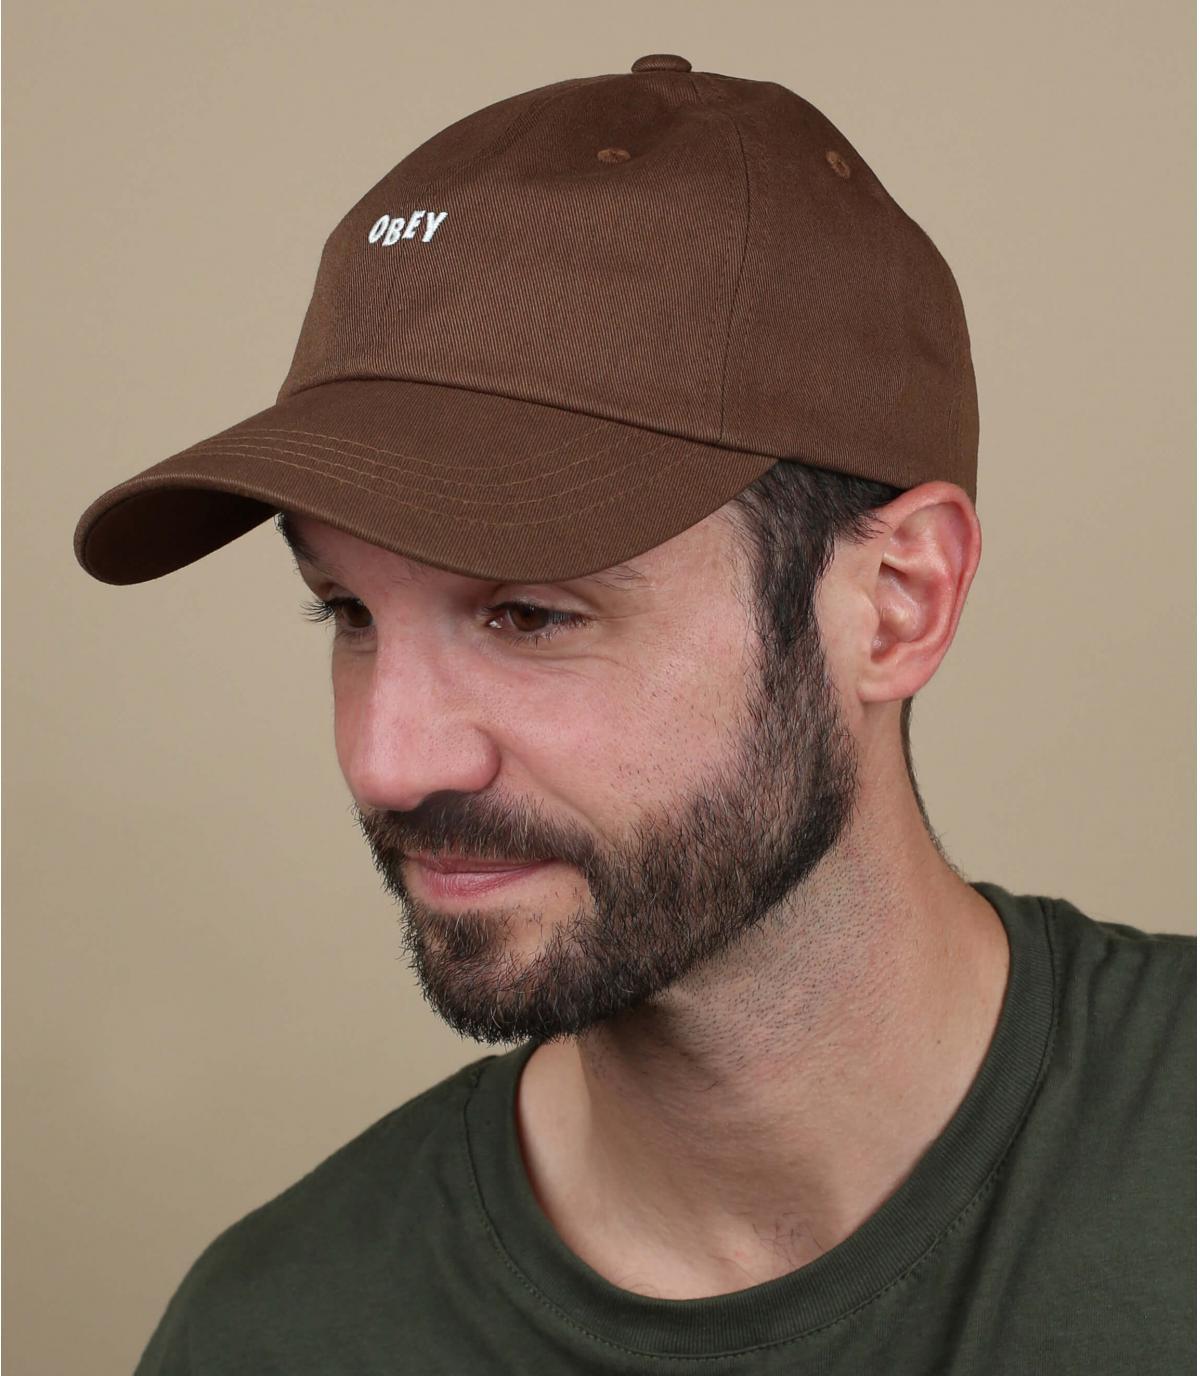 brown Obey cap